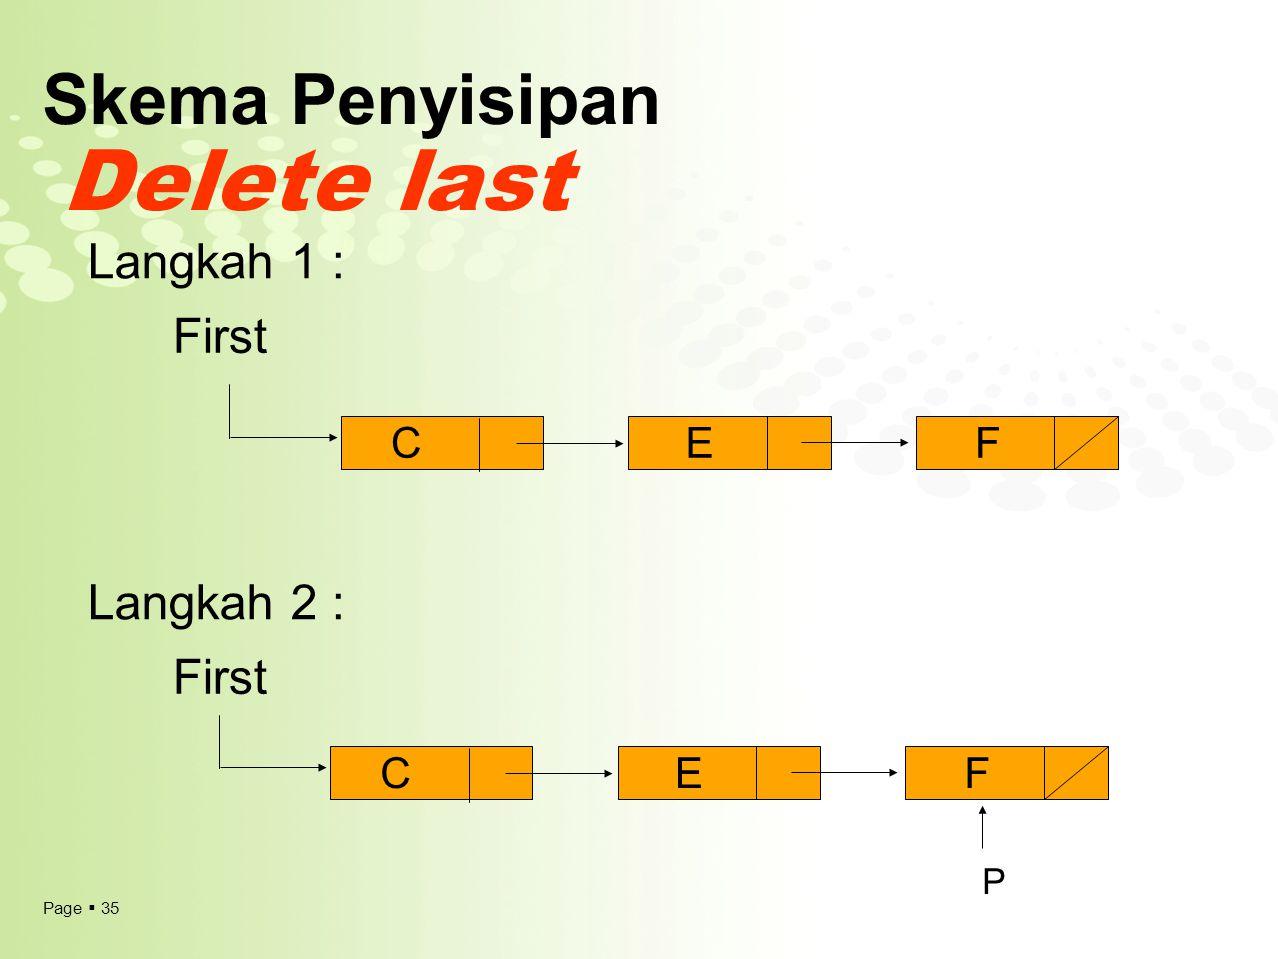 Page  35 Skema Penyisipan Delete last First Langkah 1 : Langkah 2 : CEF CEF P